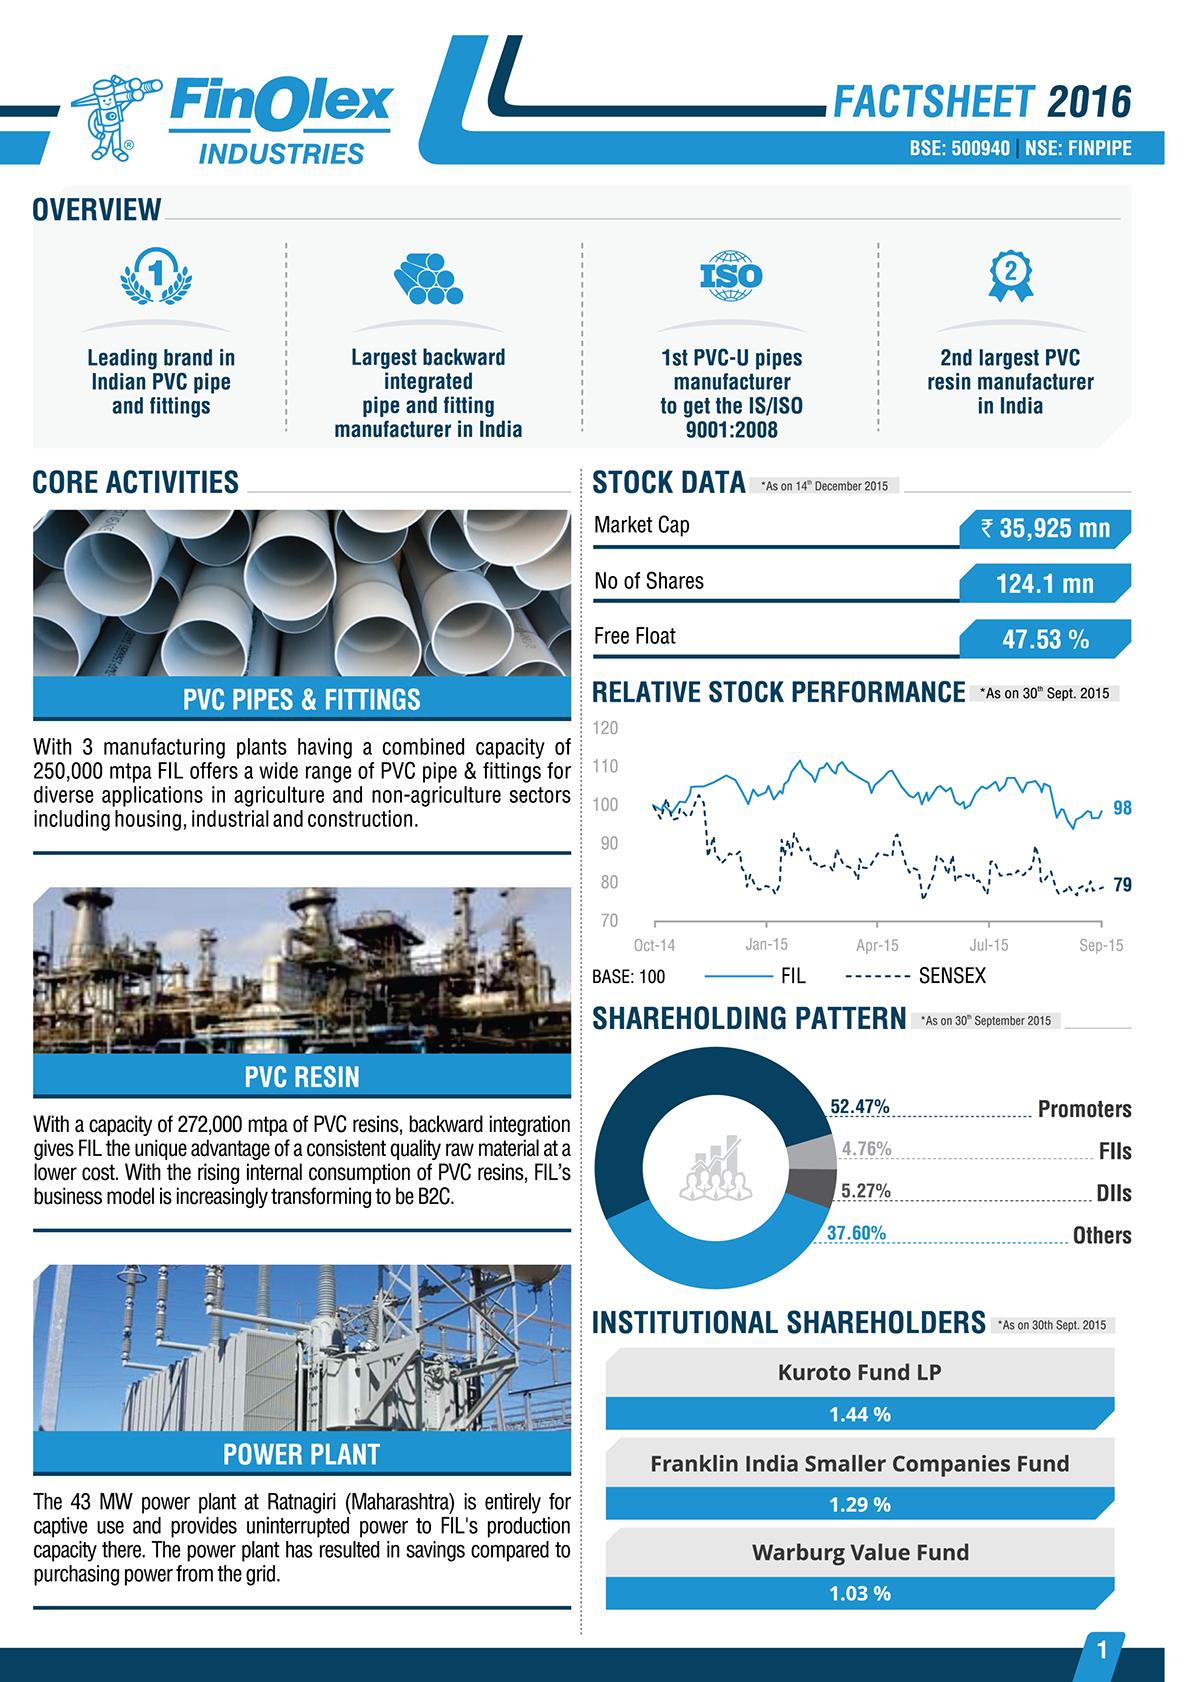 Finance Factsheets 3 on Behance